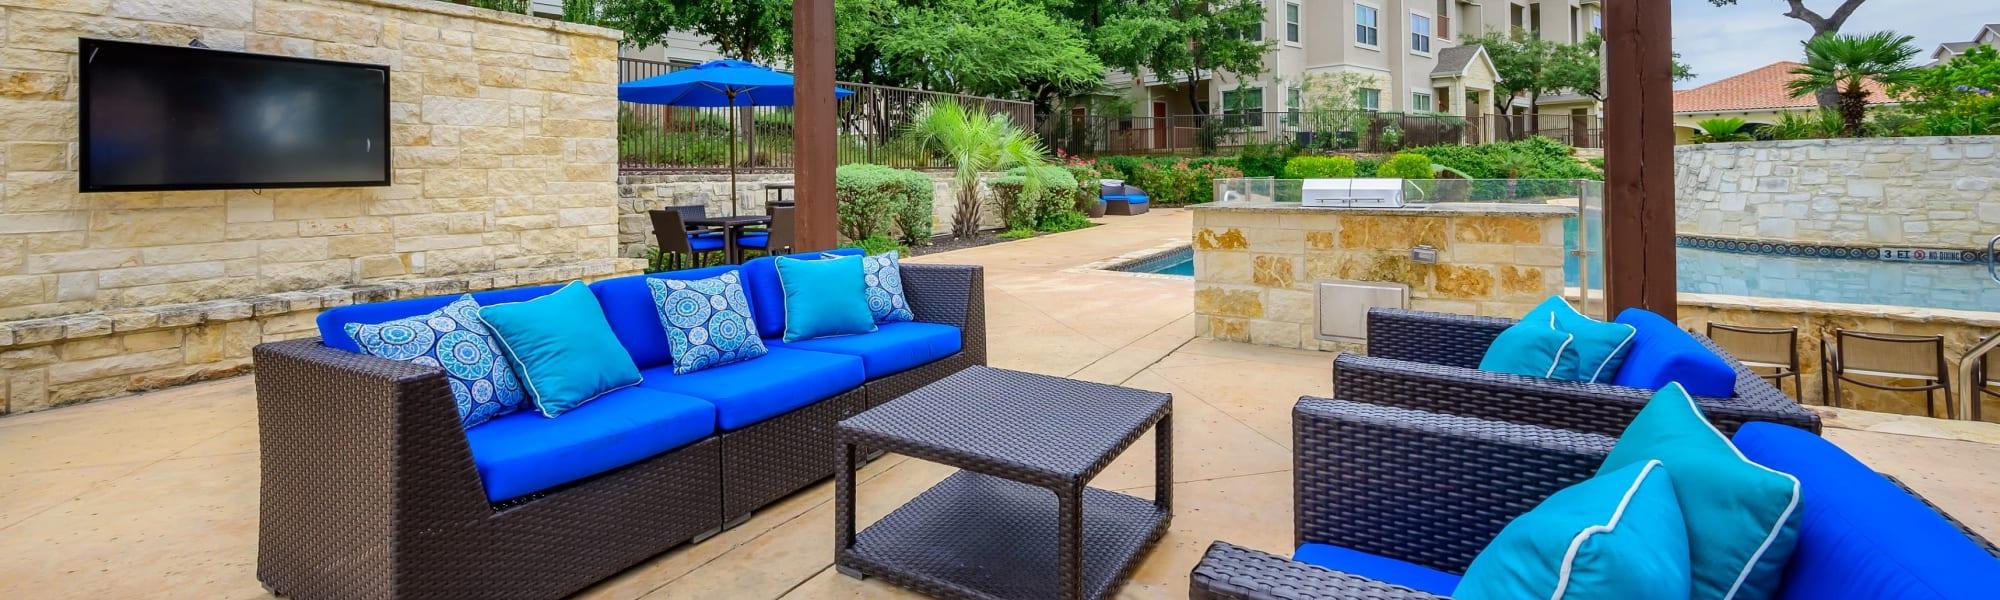 Amenities at Pecan Springs Apartments in San Antonio, Texas